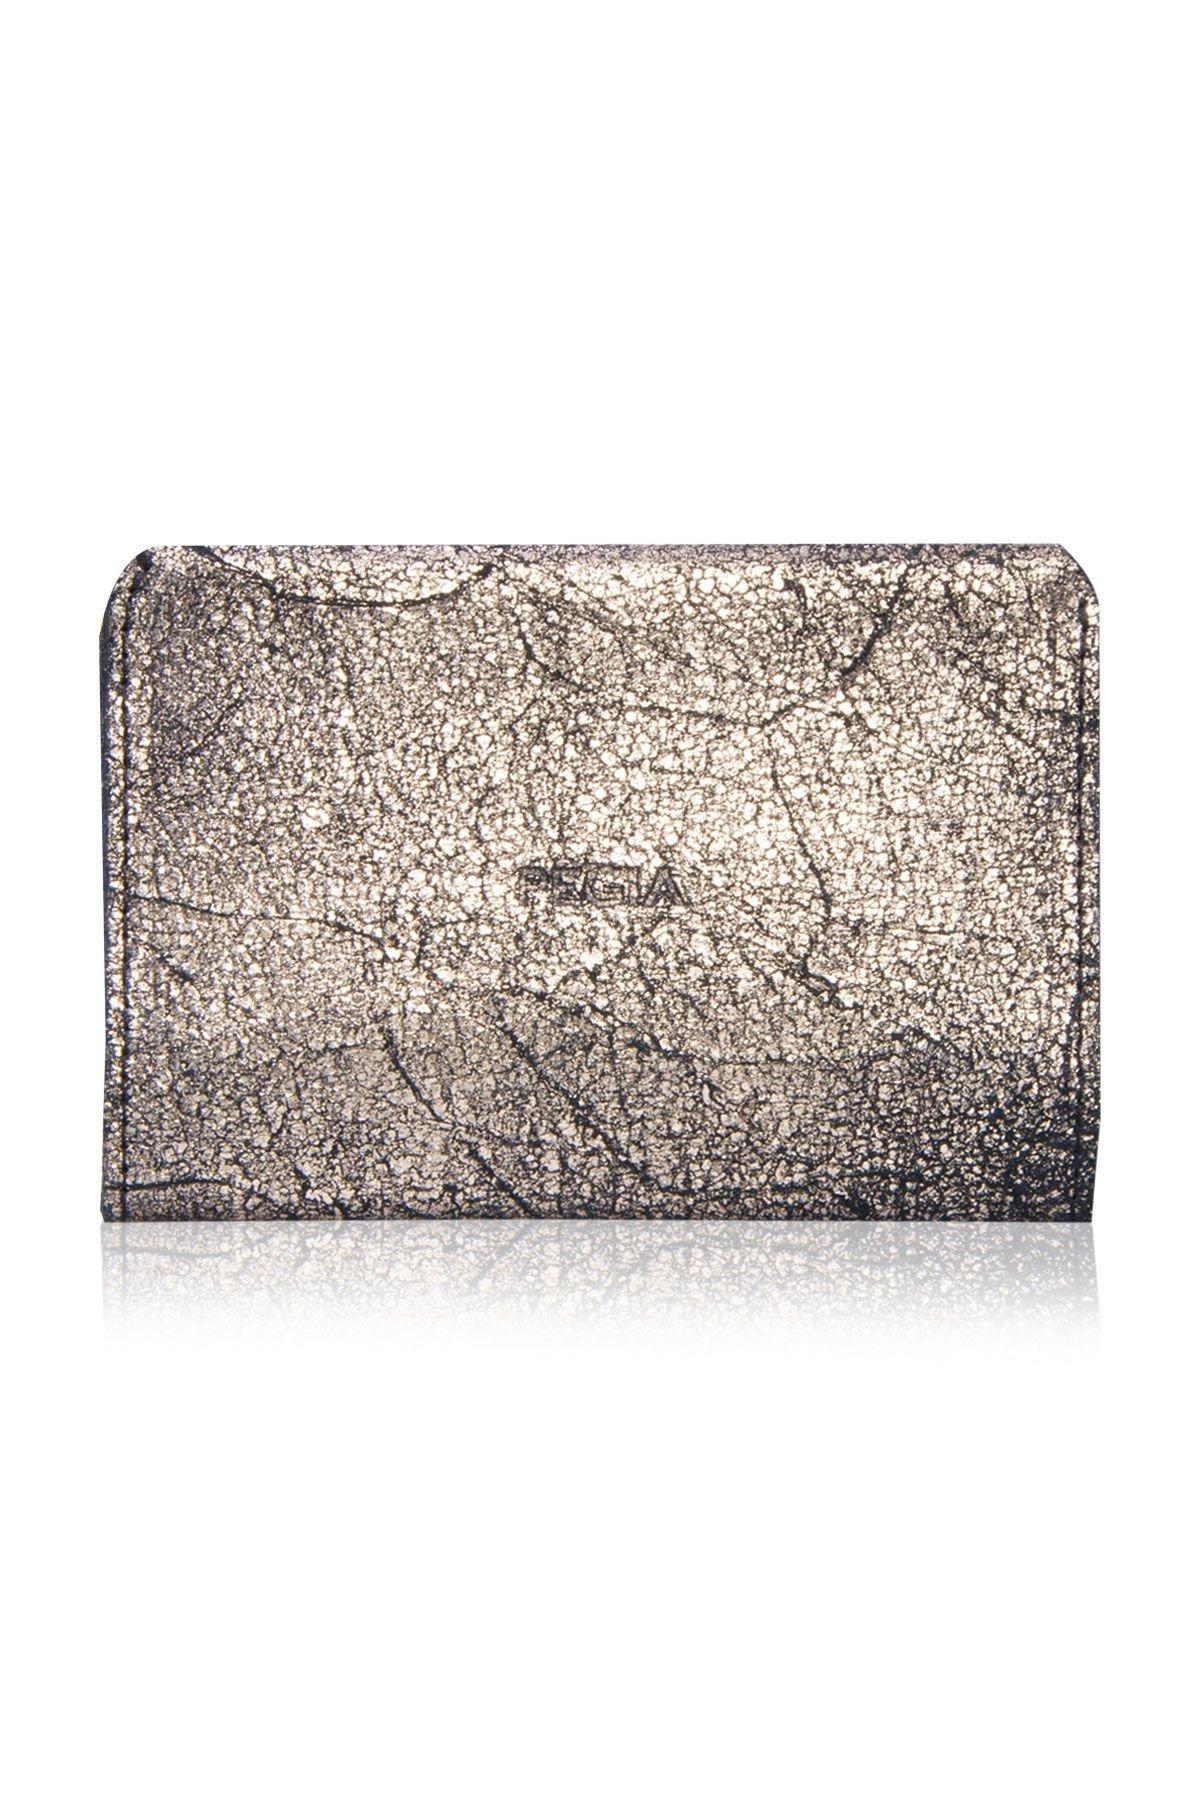 Pegia Original Leather Gilded Wallet Big Size  19CZ303 Silver